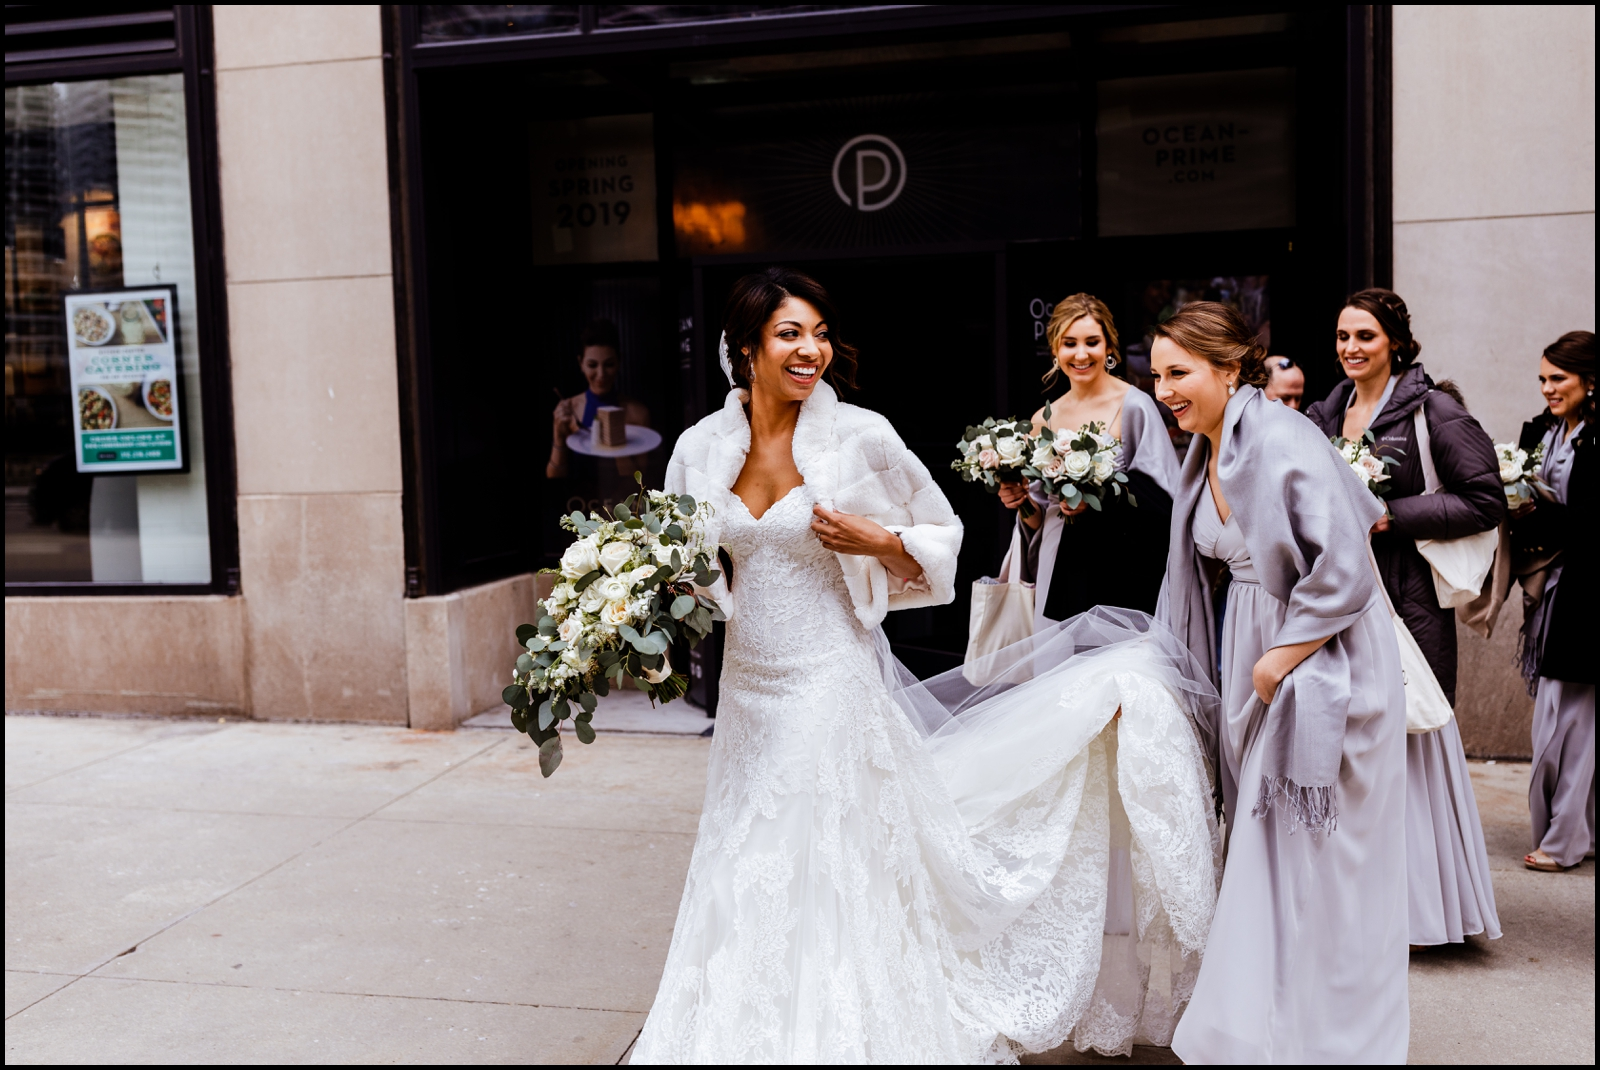 Chicago Wedding- Alice Millar Chapel Ceremony, London House Reception_0066.jpg